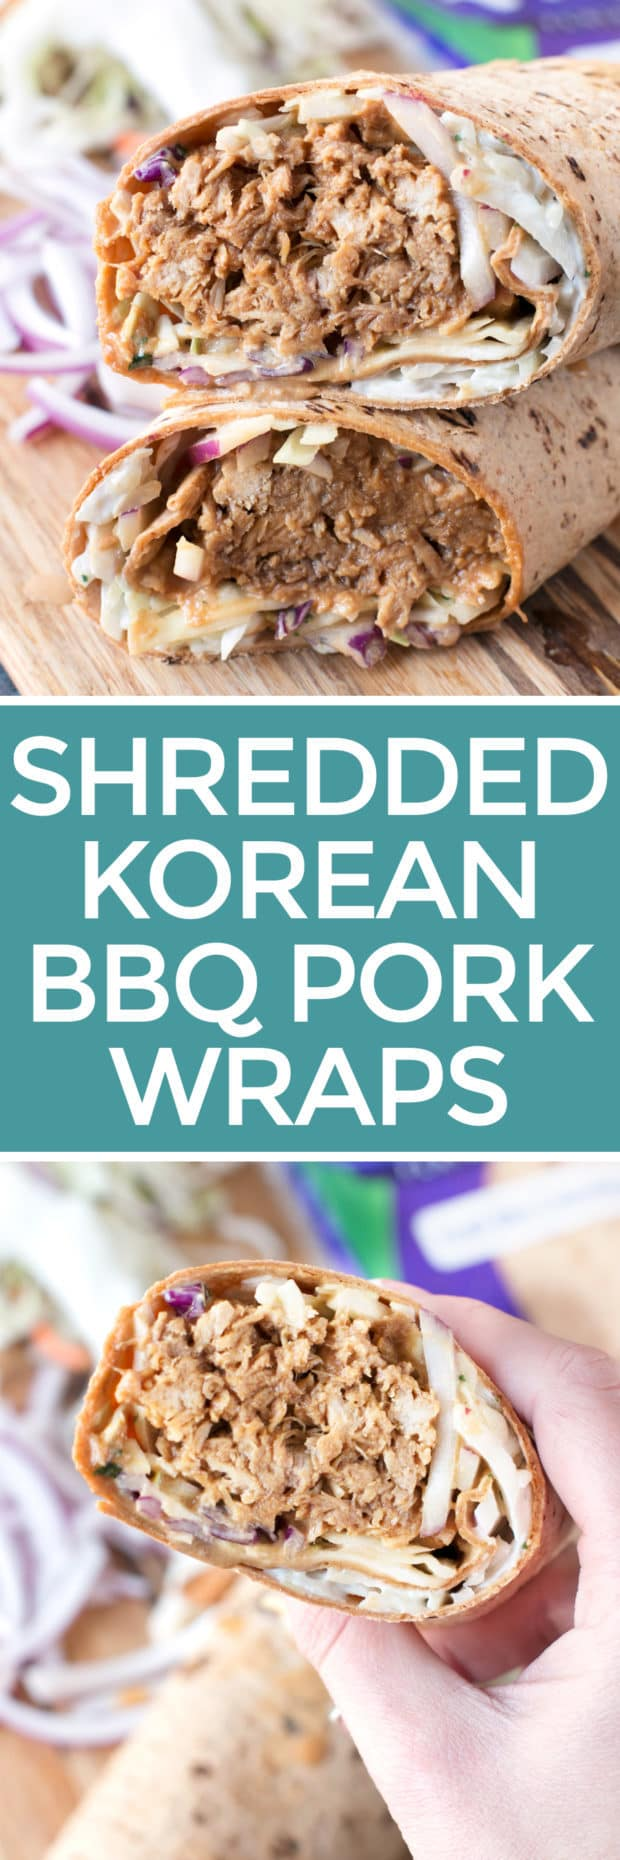 Shredded Pork Korean BBQ Wraps with Kimchi Slaw   cakenknife.com #sponsored #lunch #healthy